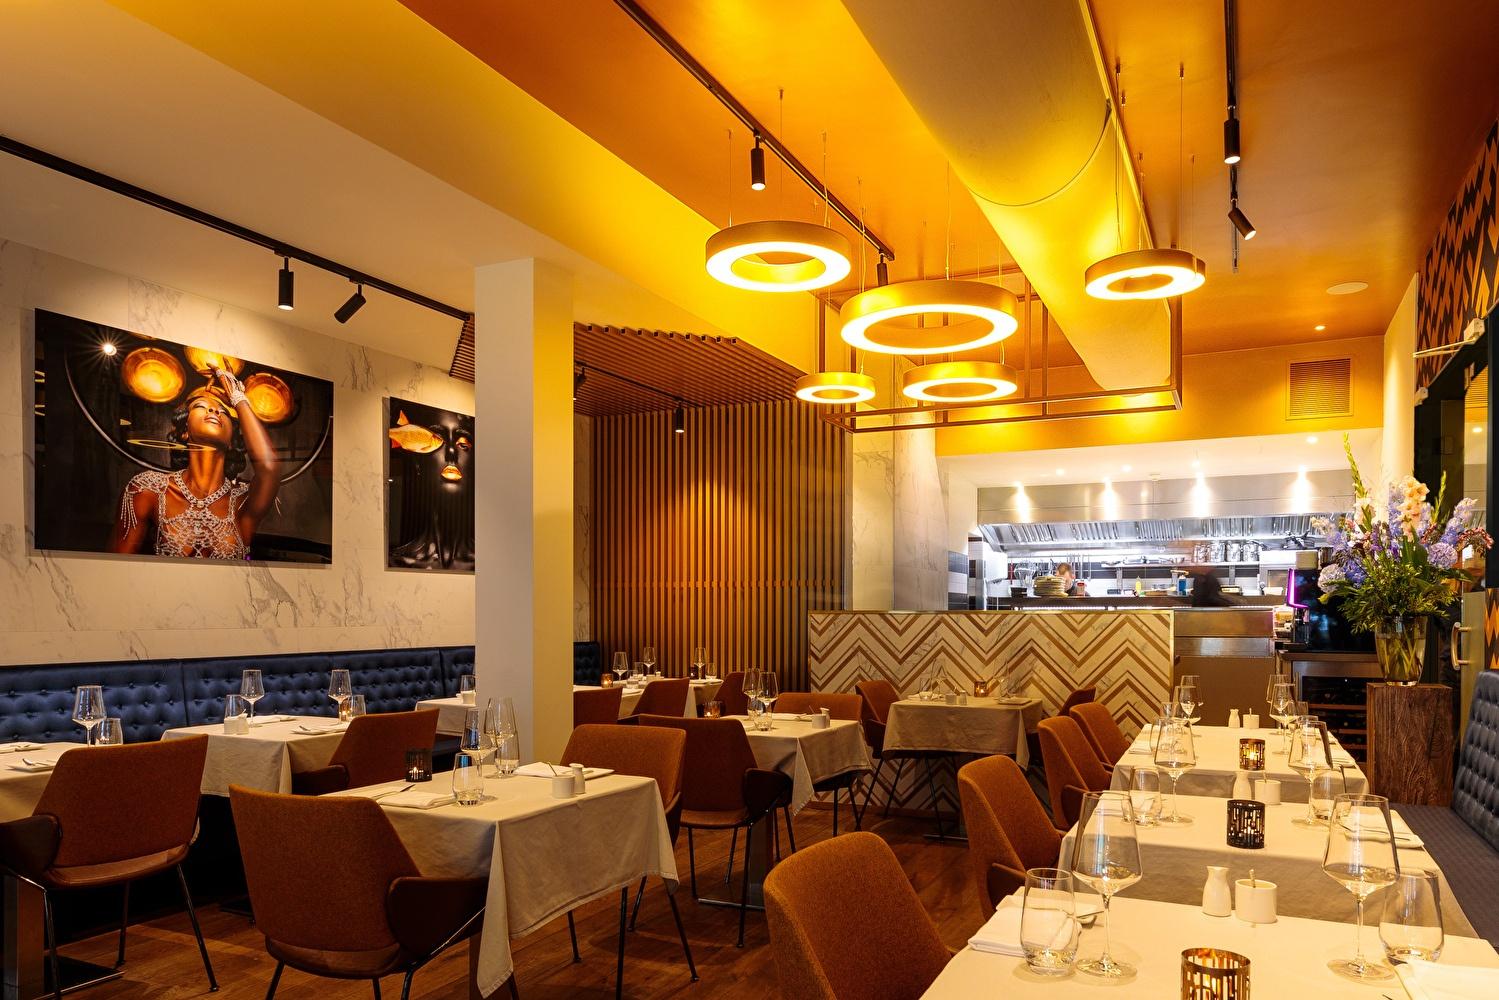 Senses restaurant Amsterdam - Amsterdam centrum